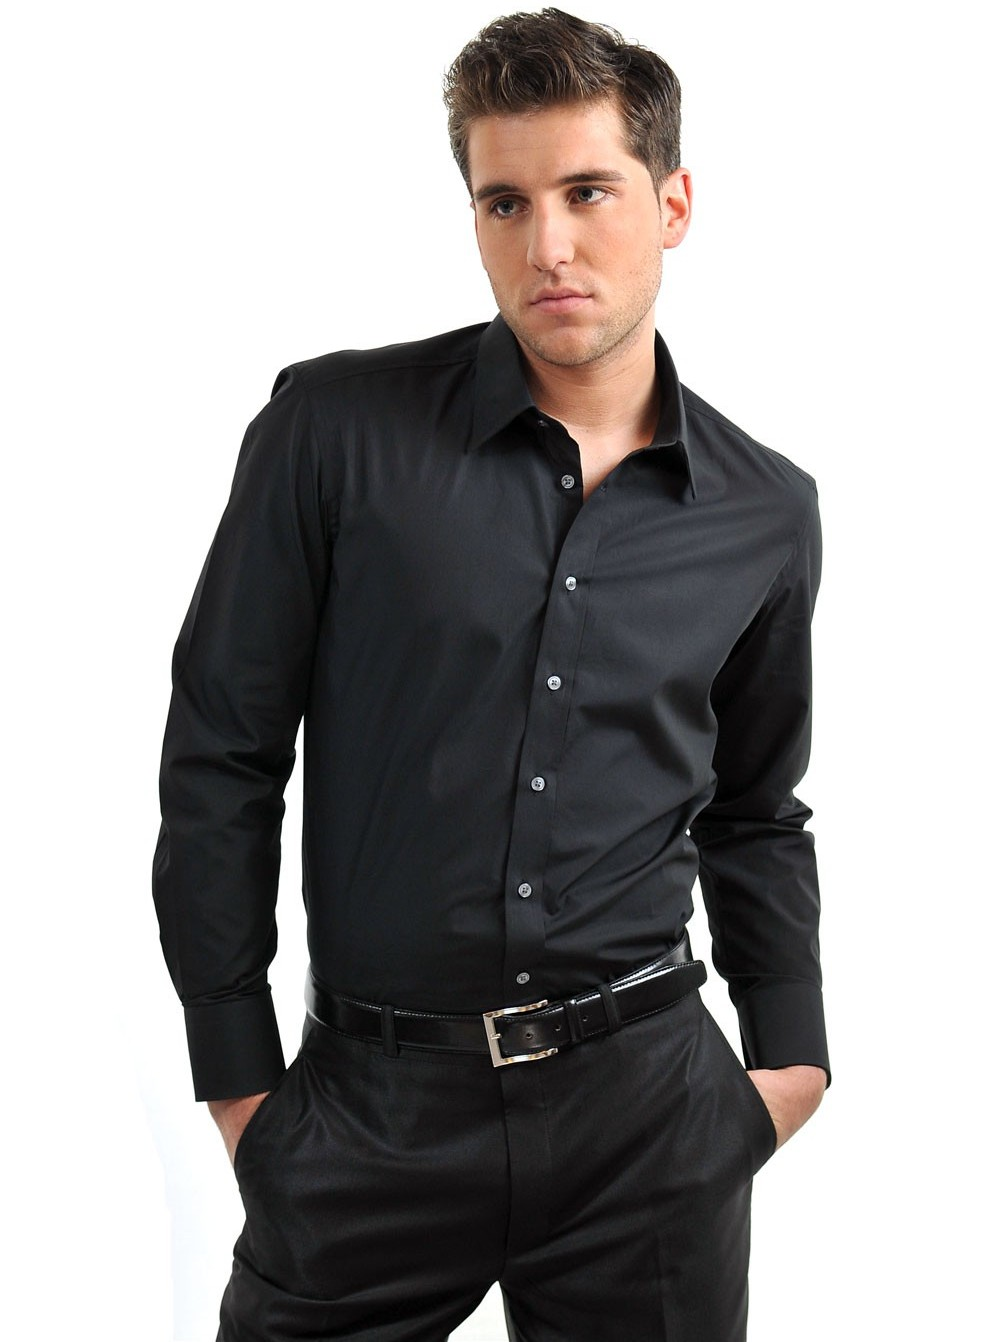 black-shirt-for-mendress-shirt-men---black---dress-shirts---cp-men-247ebasl